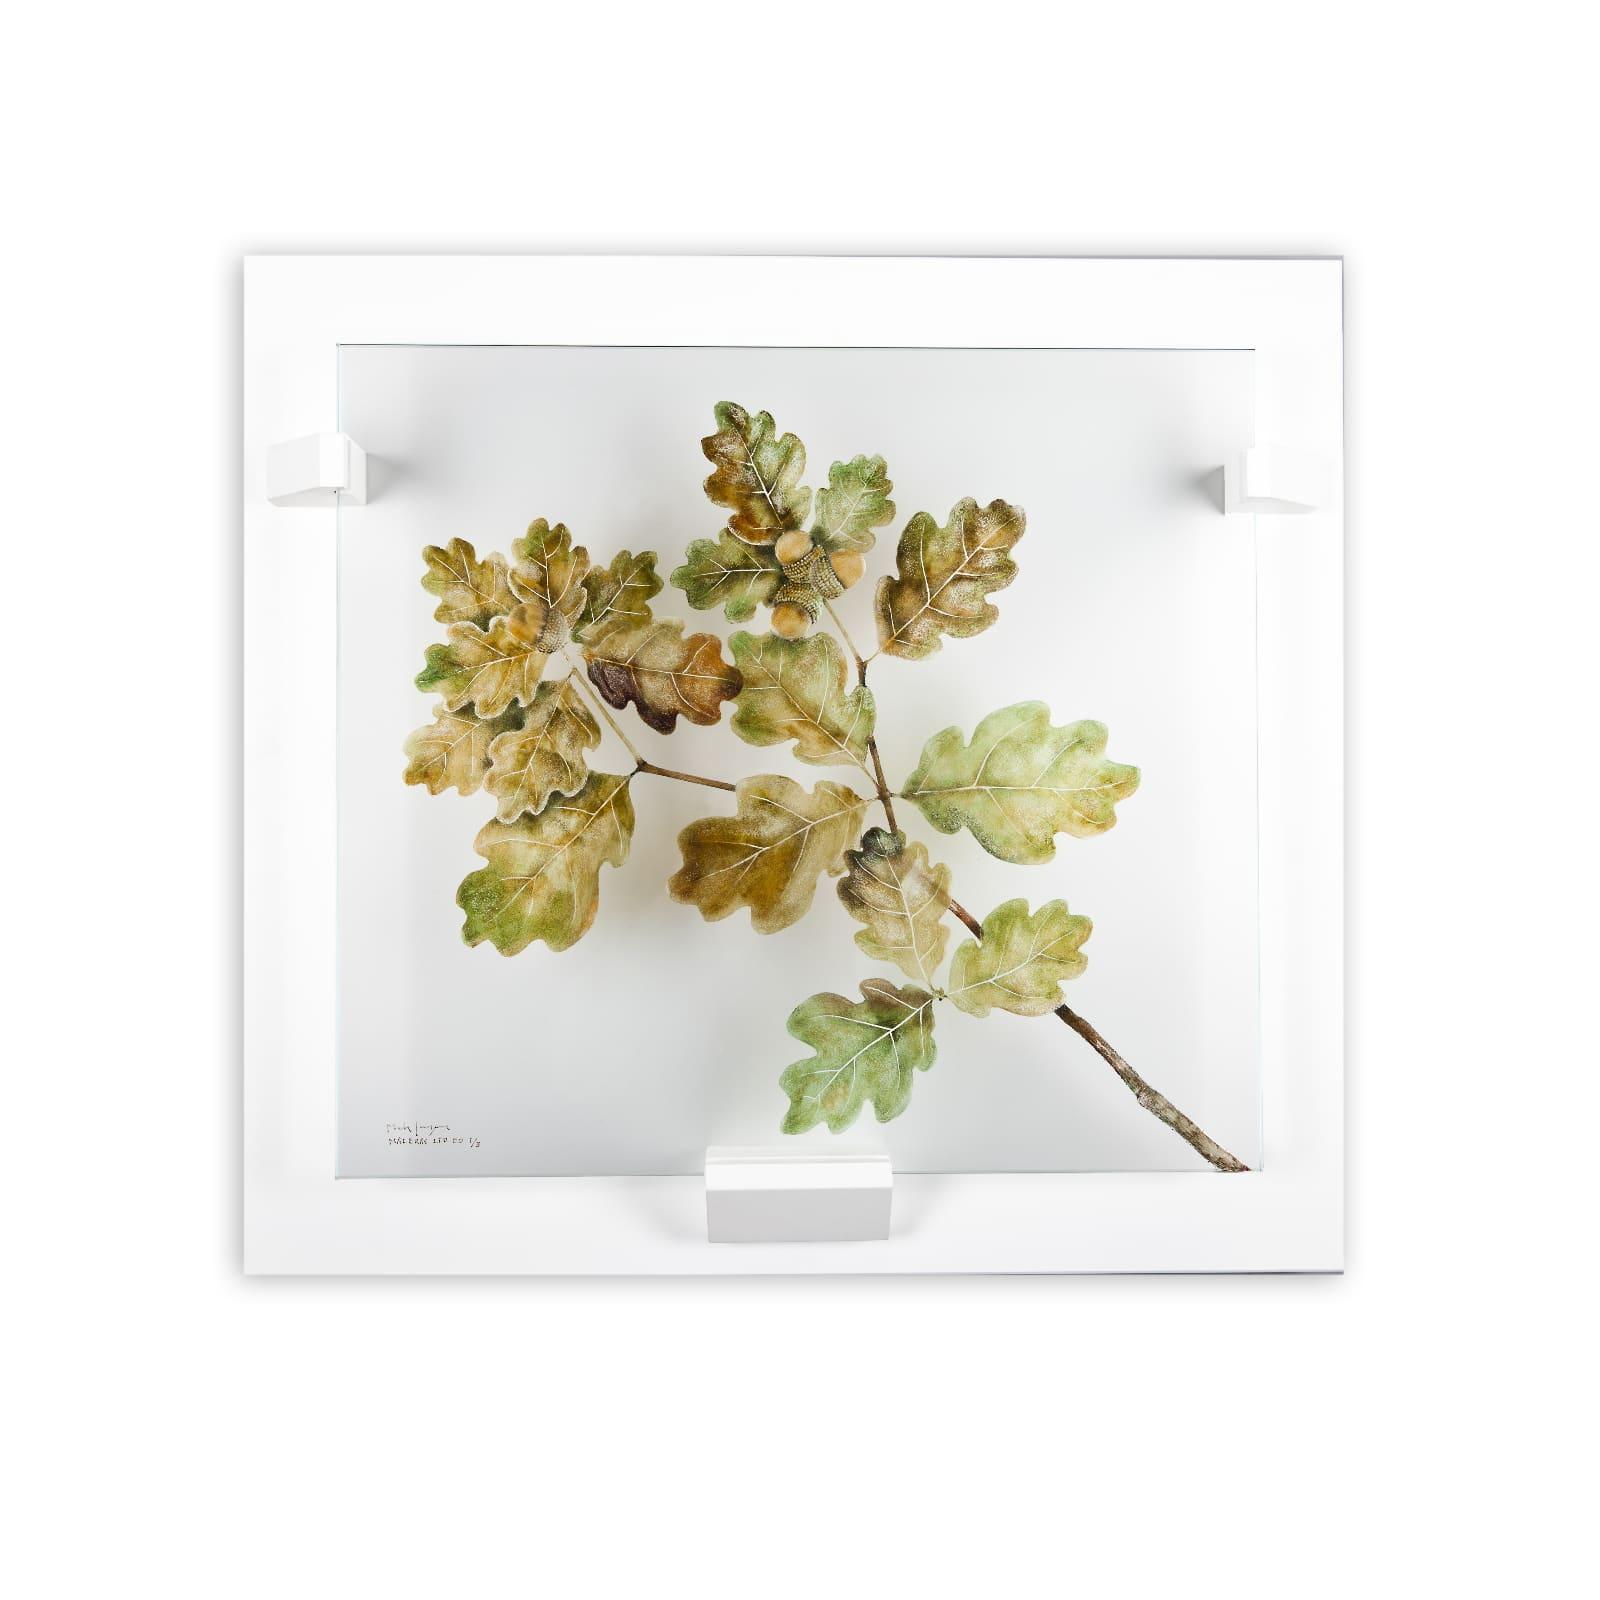 Mats Jonasson - Oak Leaves